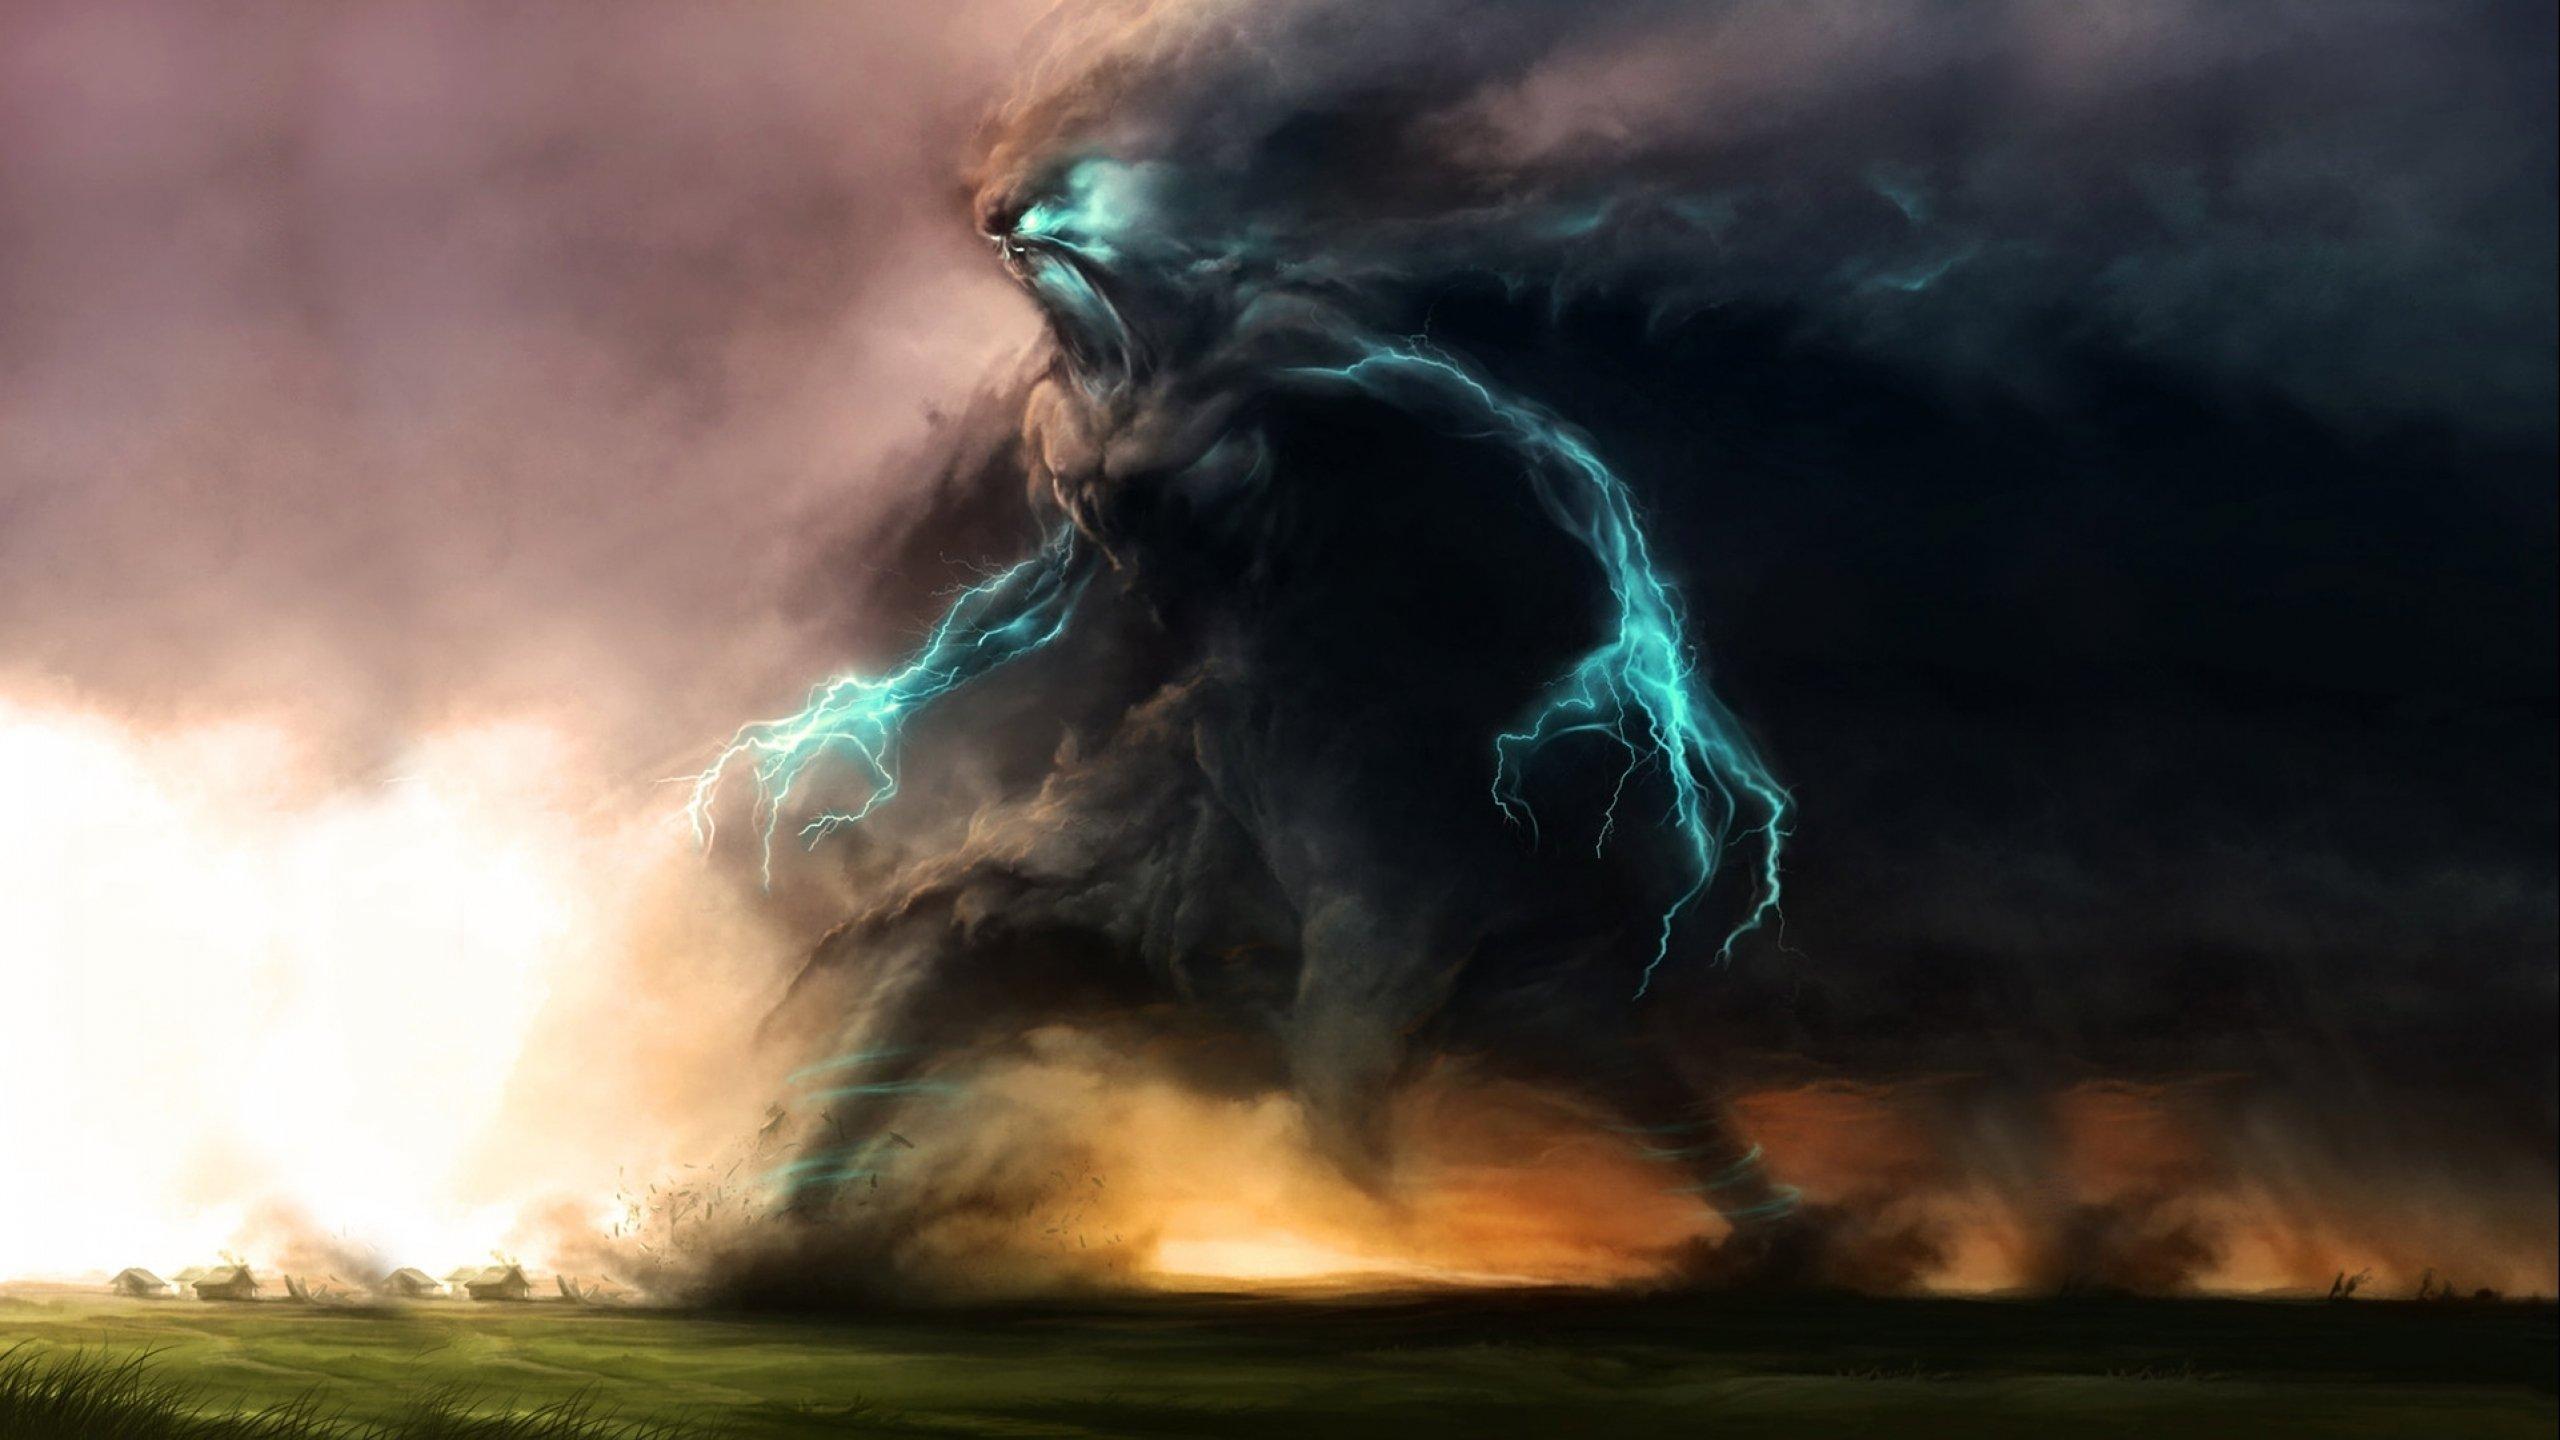 Fantasy creatures artwork clip art freeuse download Fantasy creatures artwork - ClipartFest clip art freeuse download